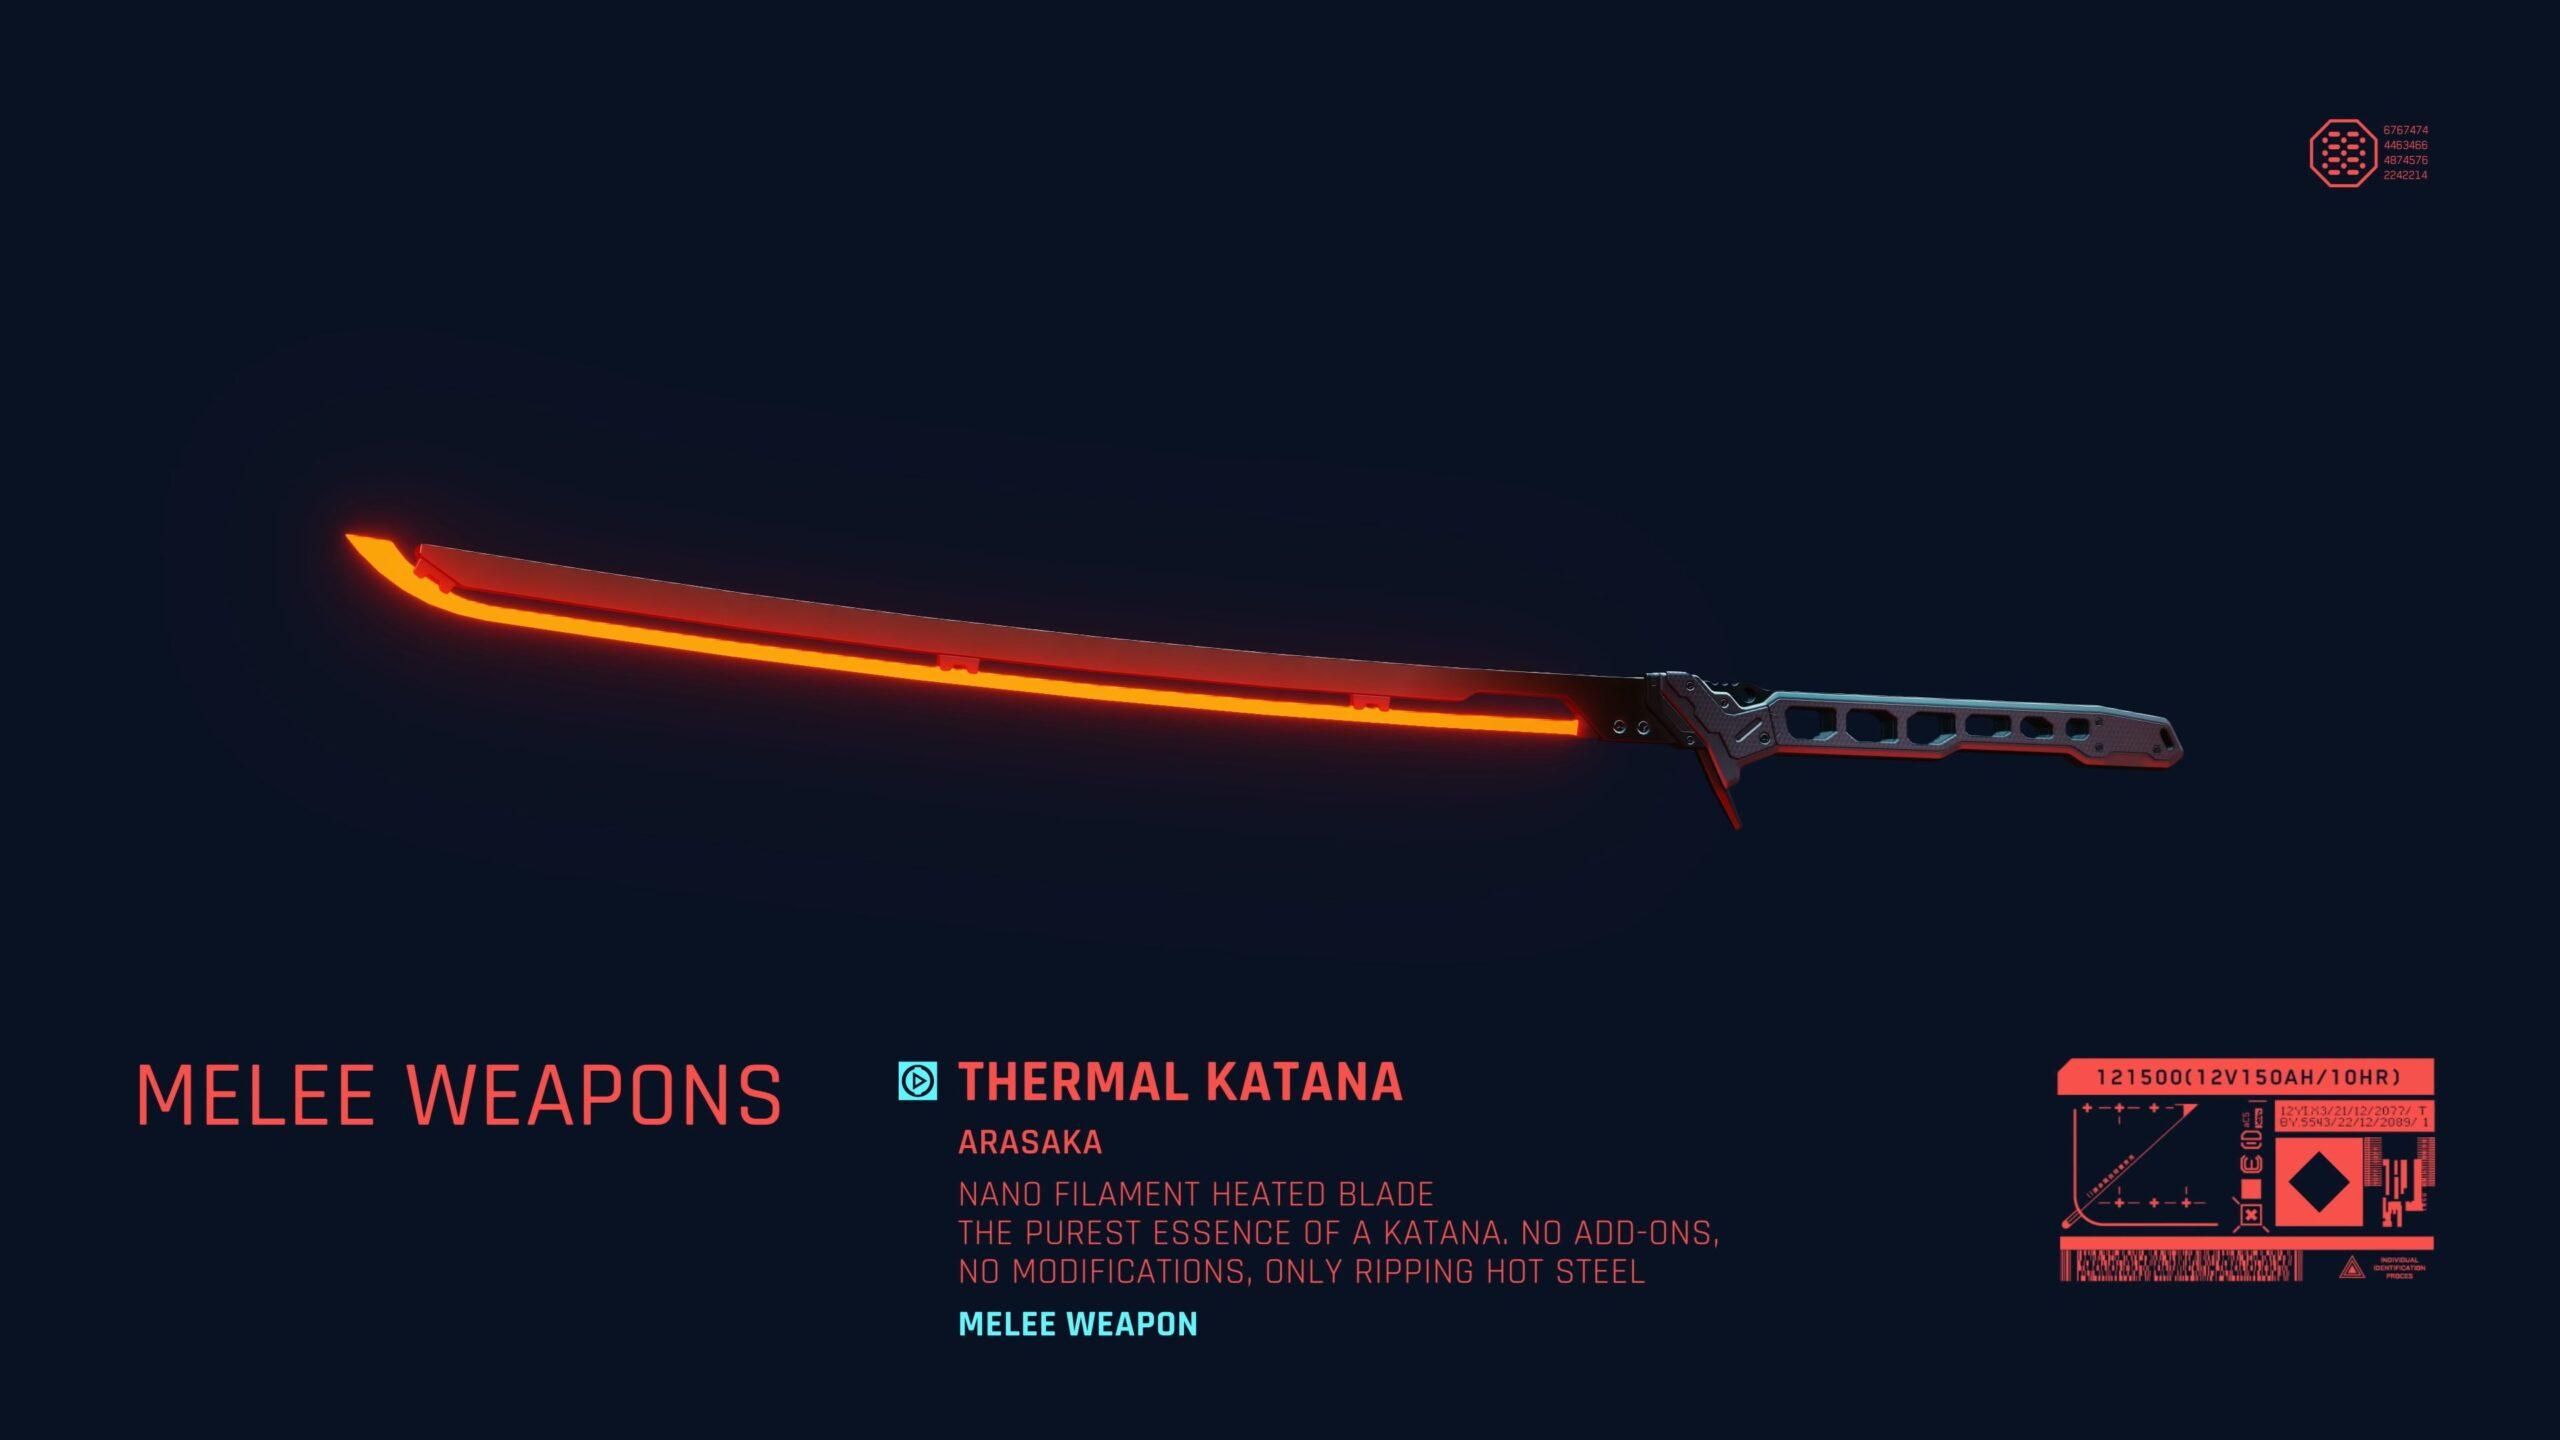 Cyberpunk 2077 Thermal Katana Blade Melee Weapon